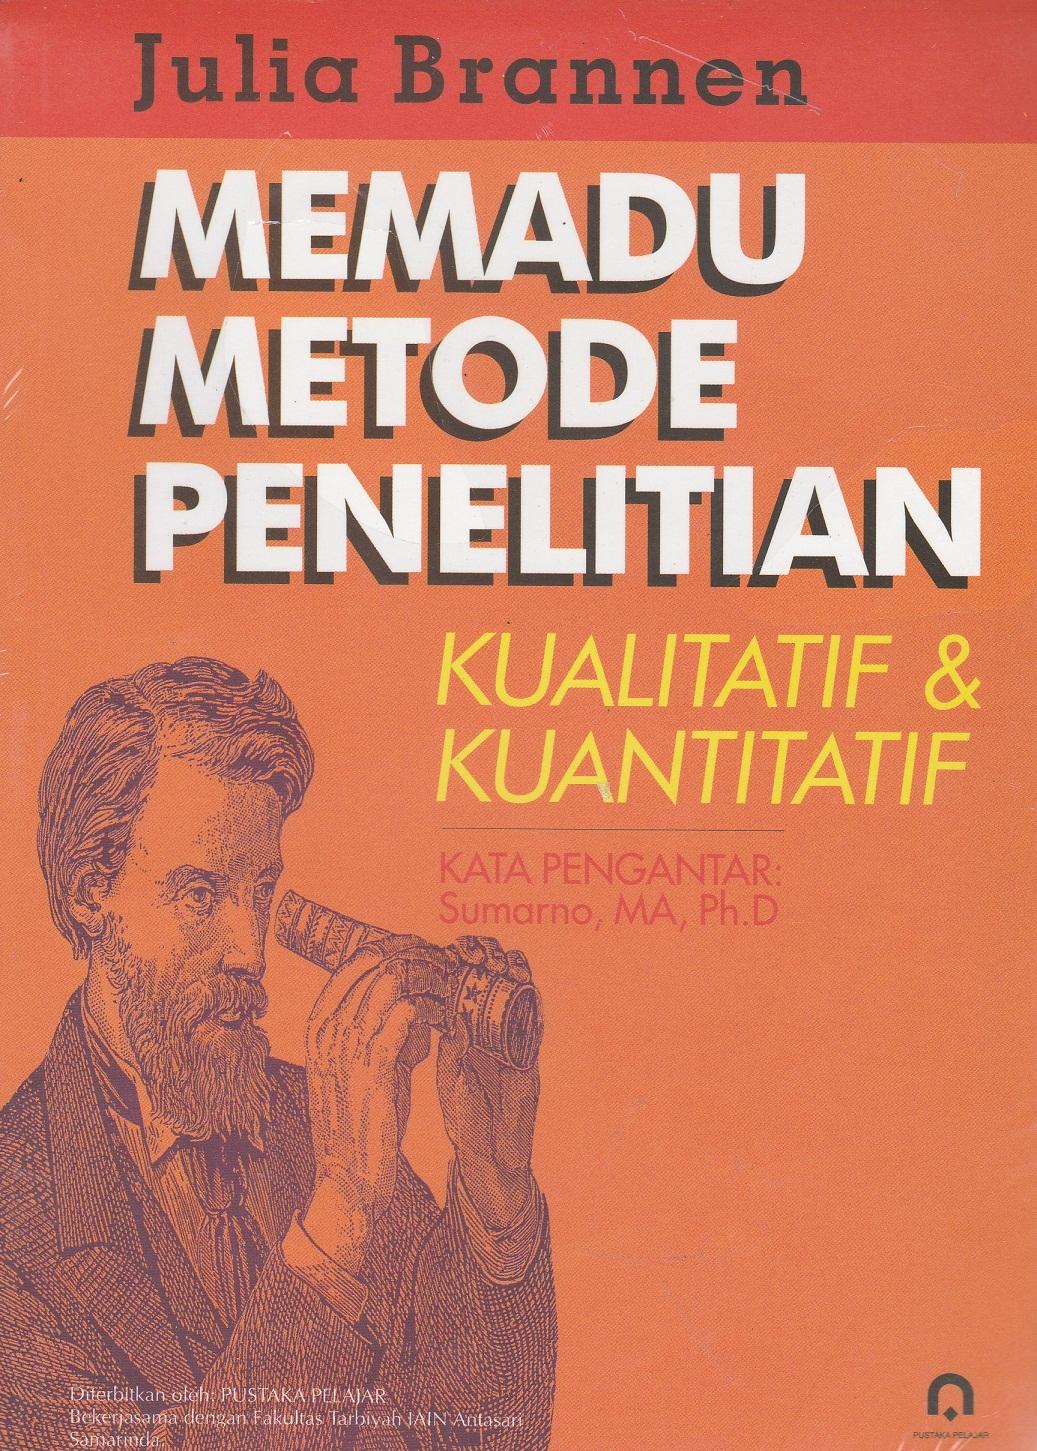 MEMADU METODE PENELITIAN KUALITATIF & KUANTITATIF - Jual